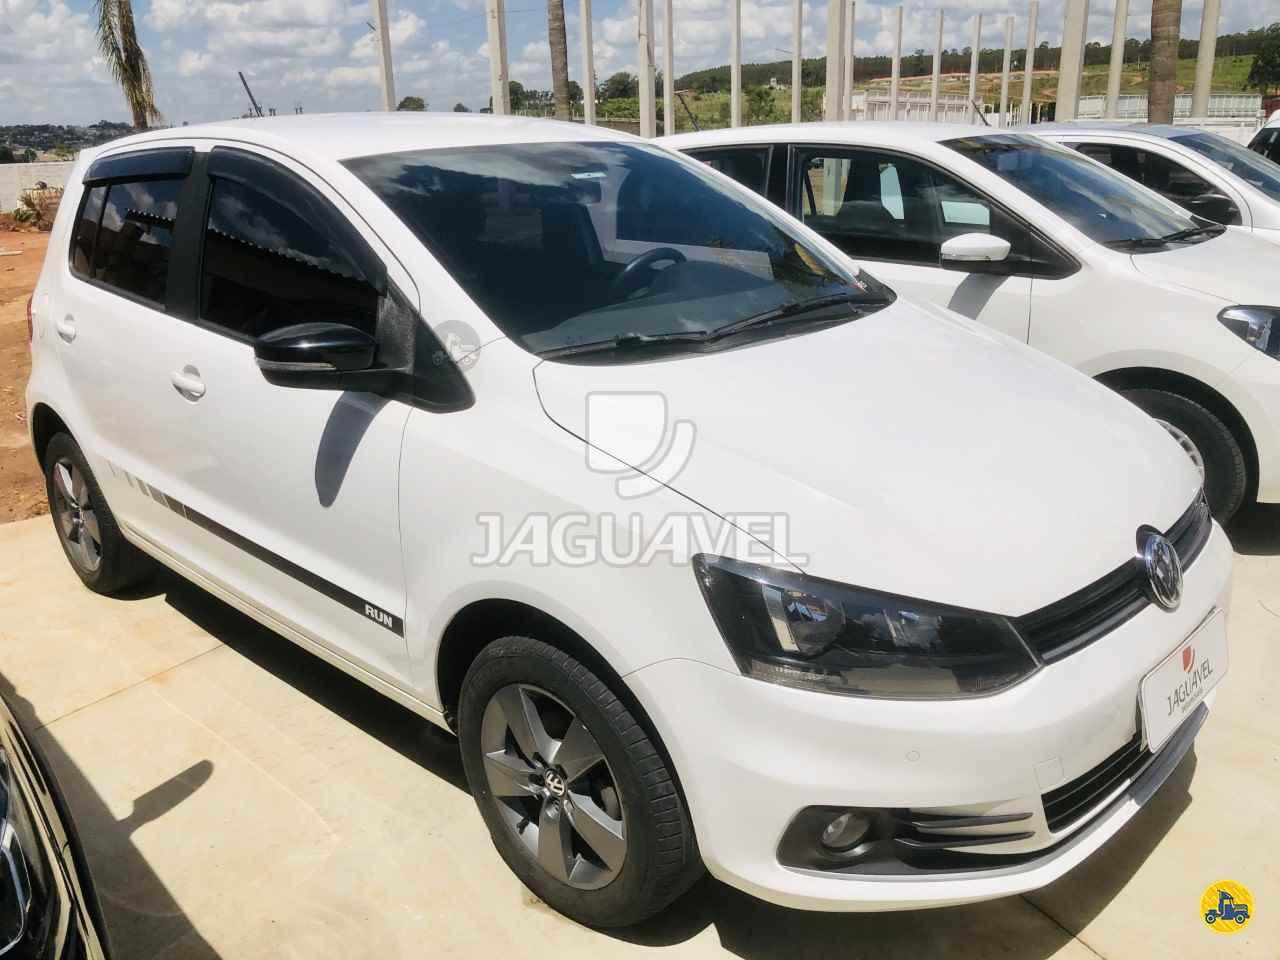 CARRO VW - Volkswagen Fox 1.6 MSI Run Jaguavel Caminhões JAGUARIAIVA PARANÁ PR